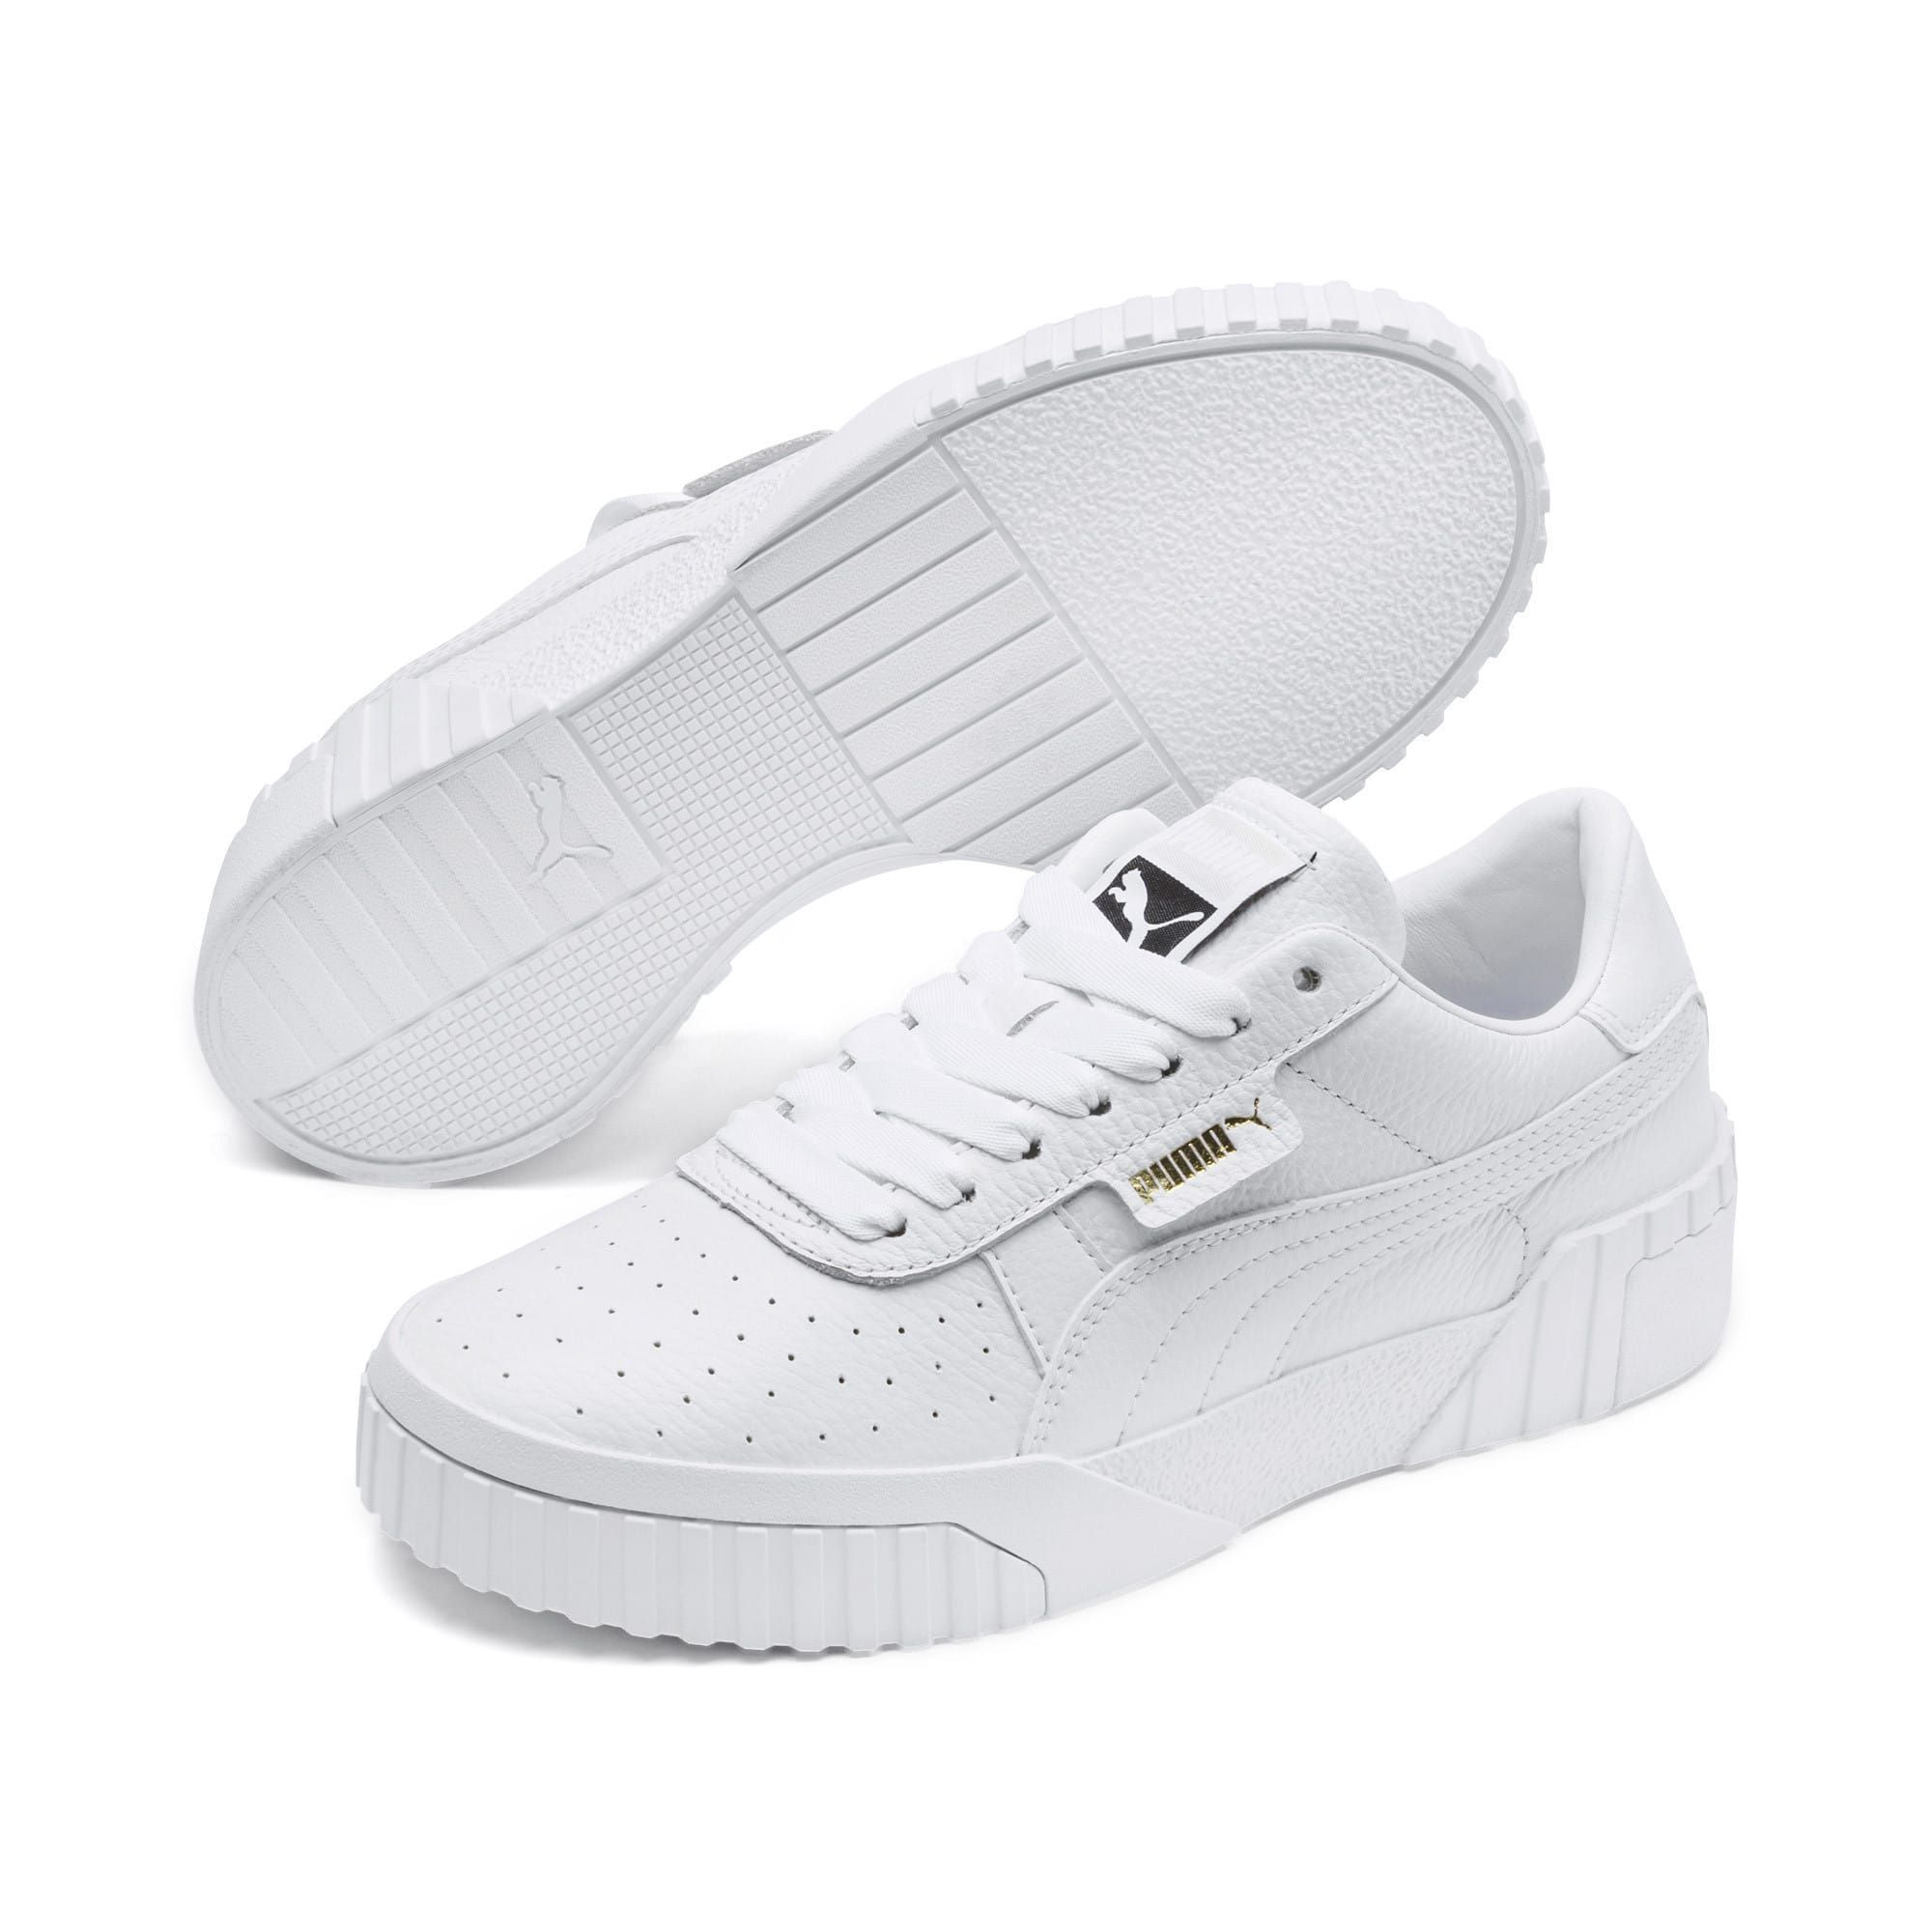 Cali Women's Sneakers | PUMA US | Puma